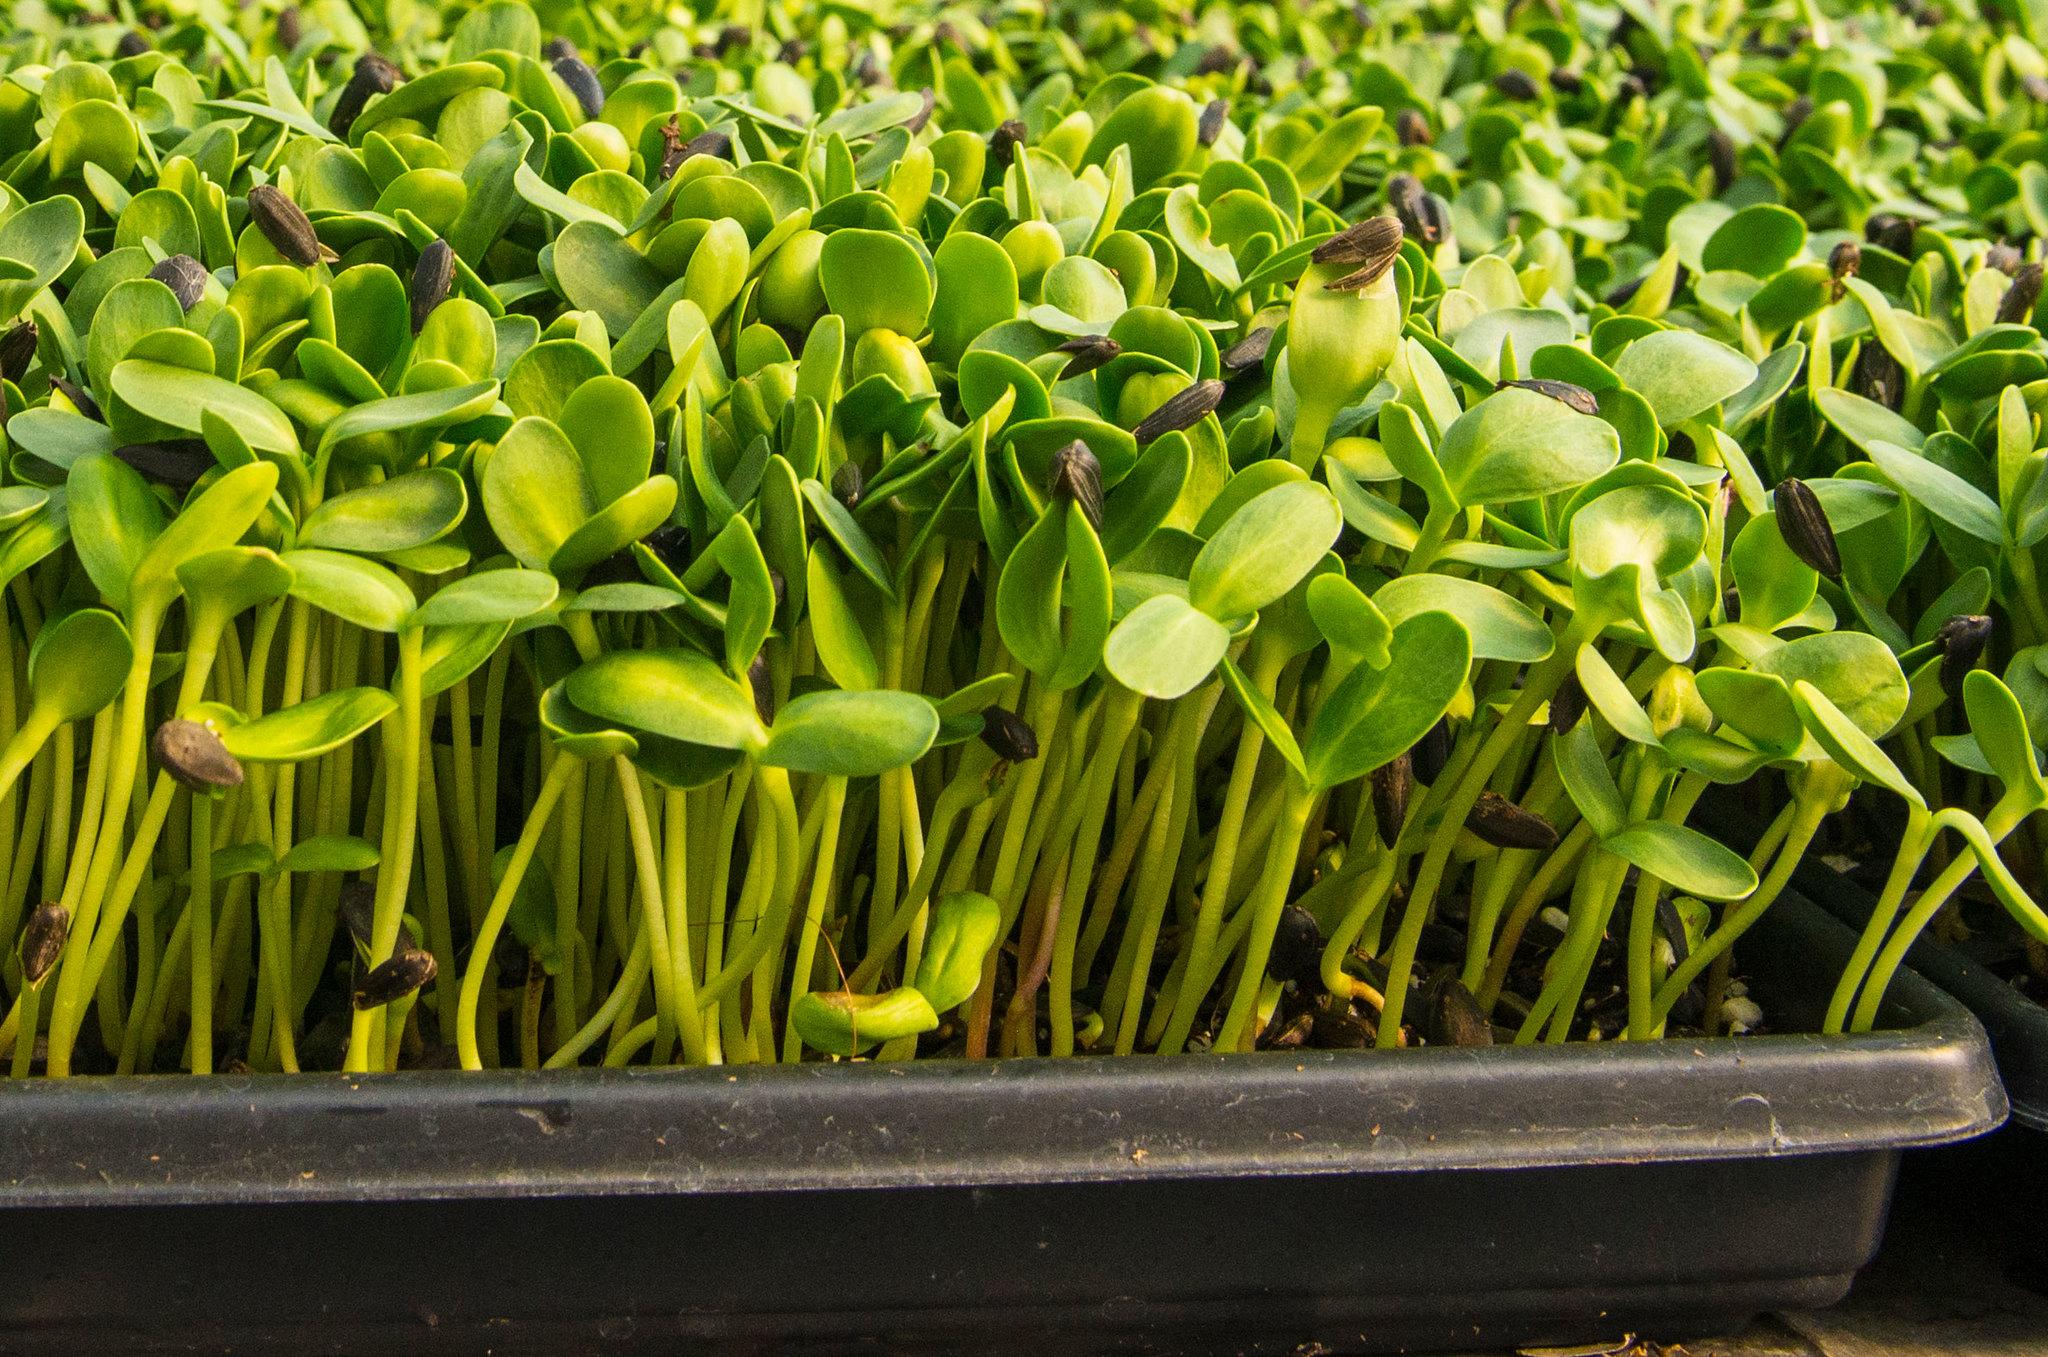 Photo of microgreens